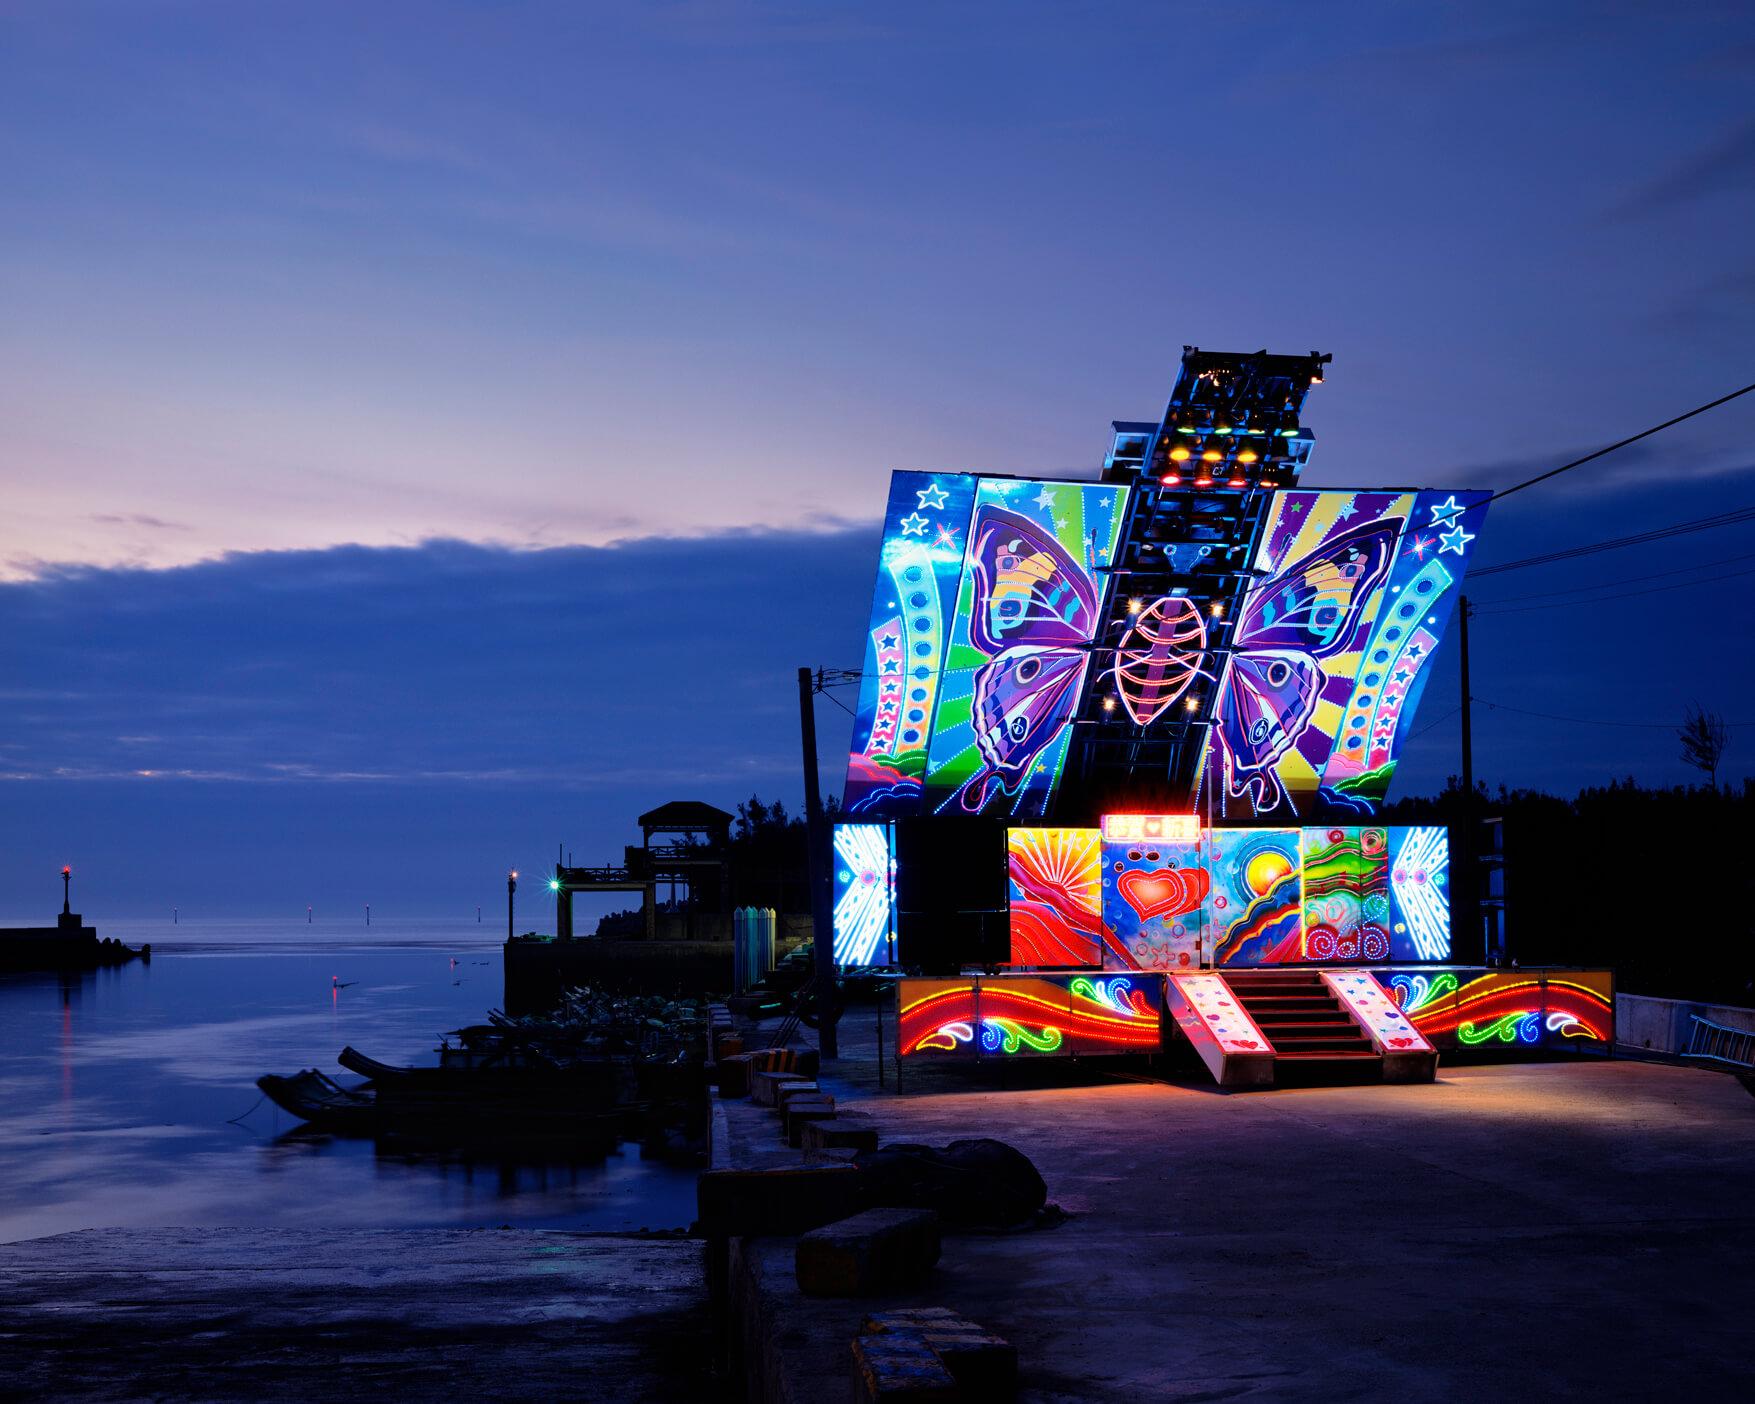 沈昭良《Stage-07-Miaoli County, Taiwan》 Light-jet C Print 40.64×50.8cm 2010 / AKI GALLERY